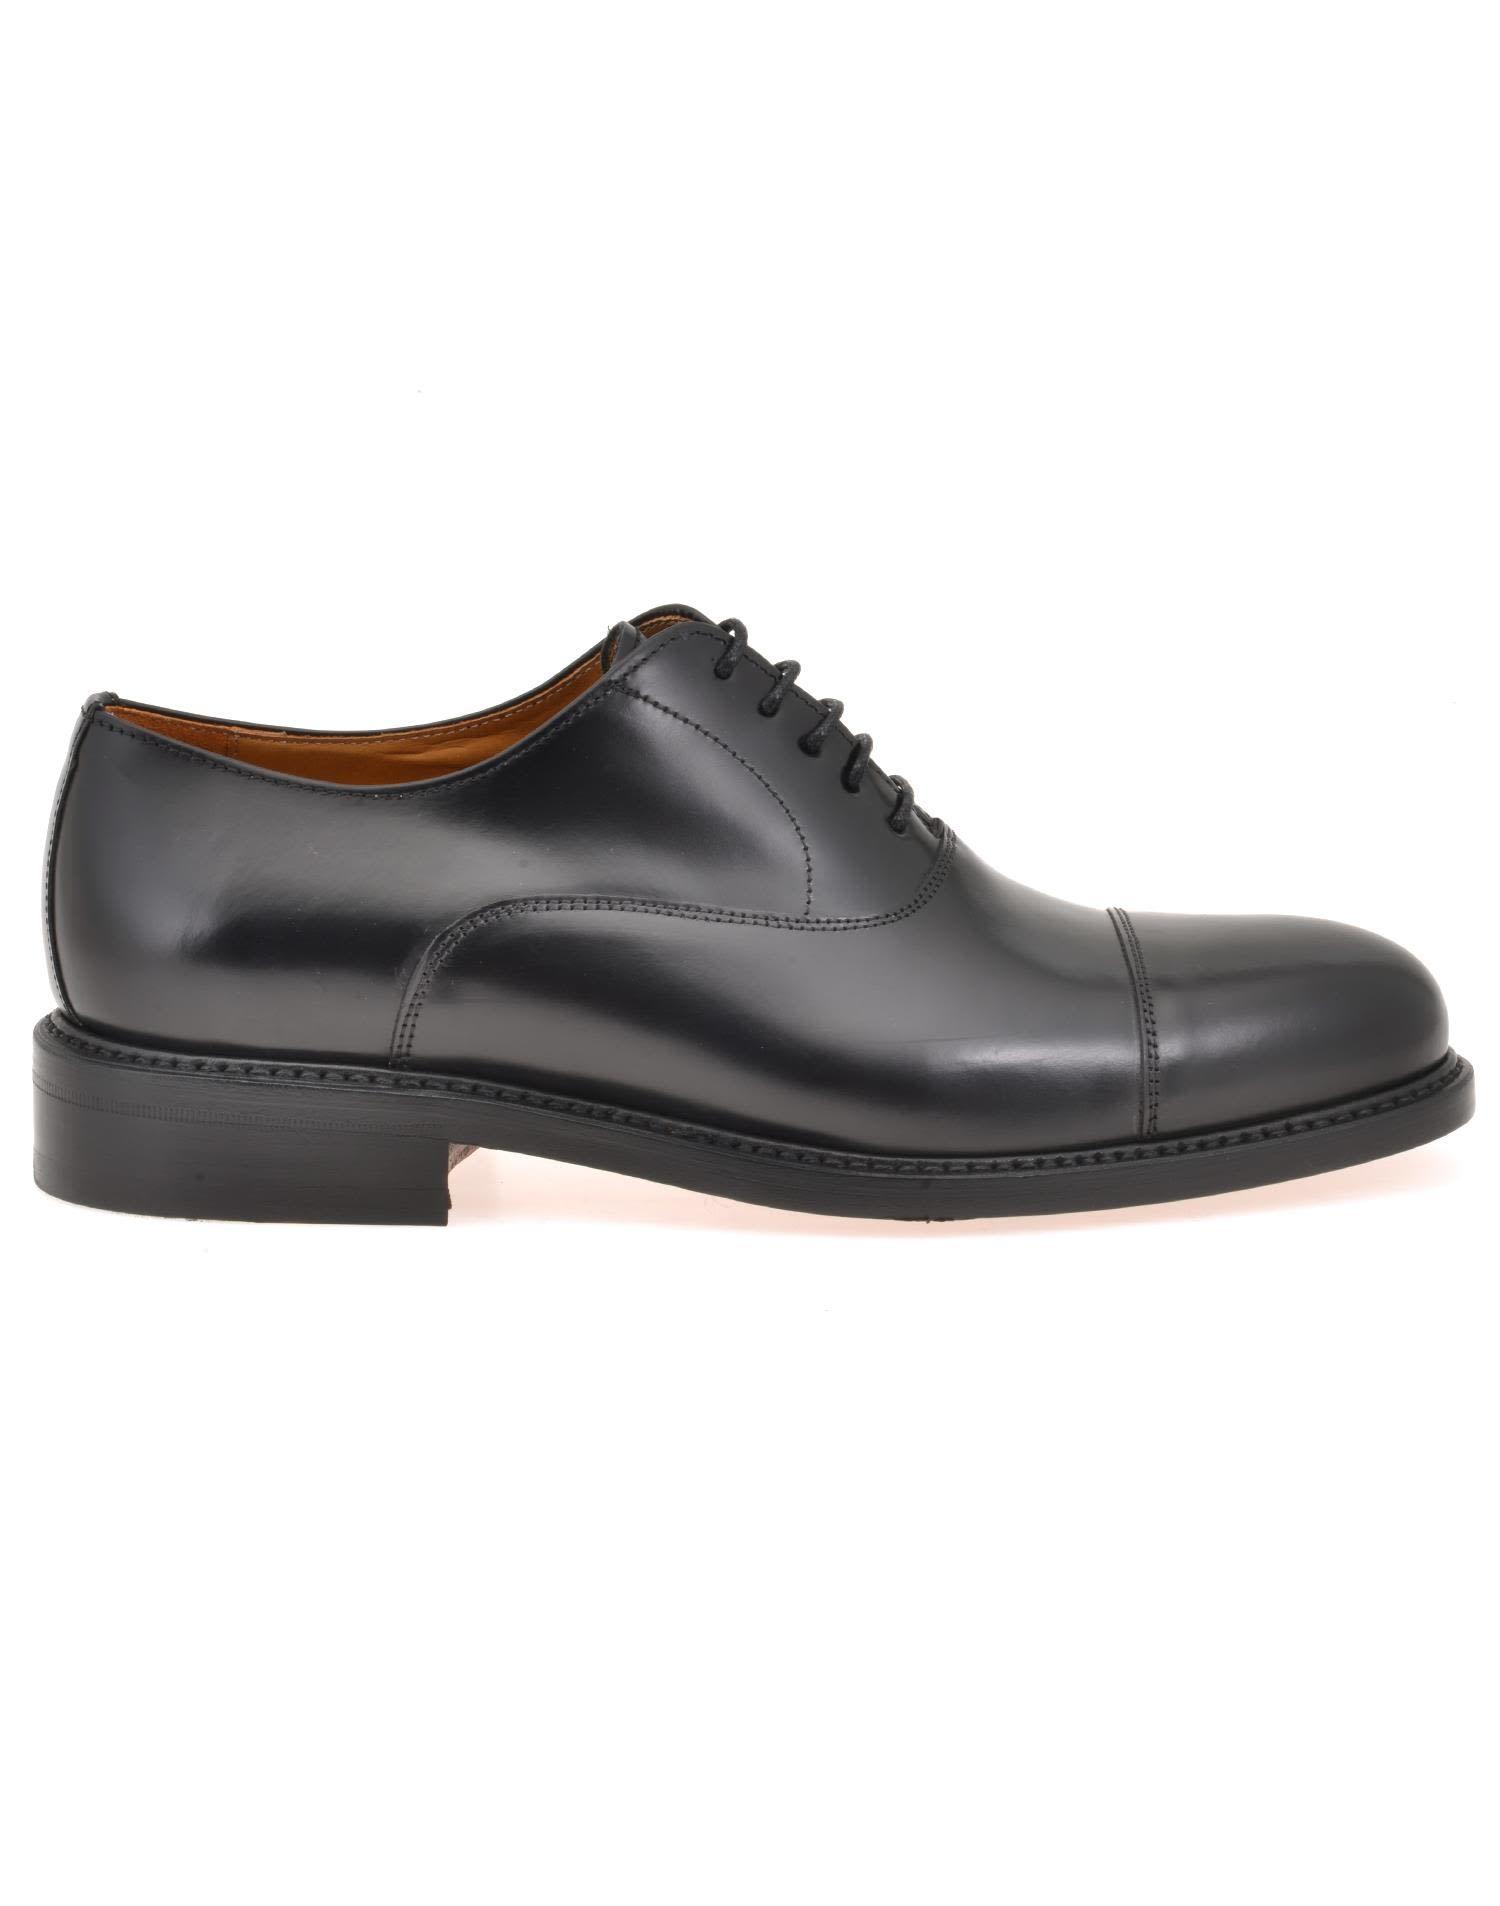 3e79178c700 BERWICK 1707 LEATHER LACE UP SHOE.  berwick  shoes